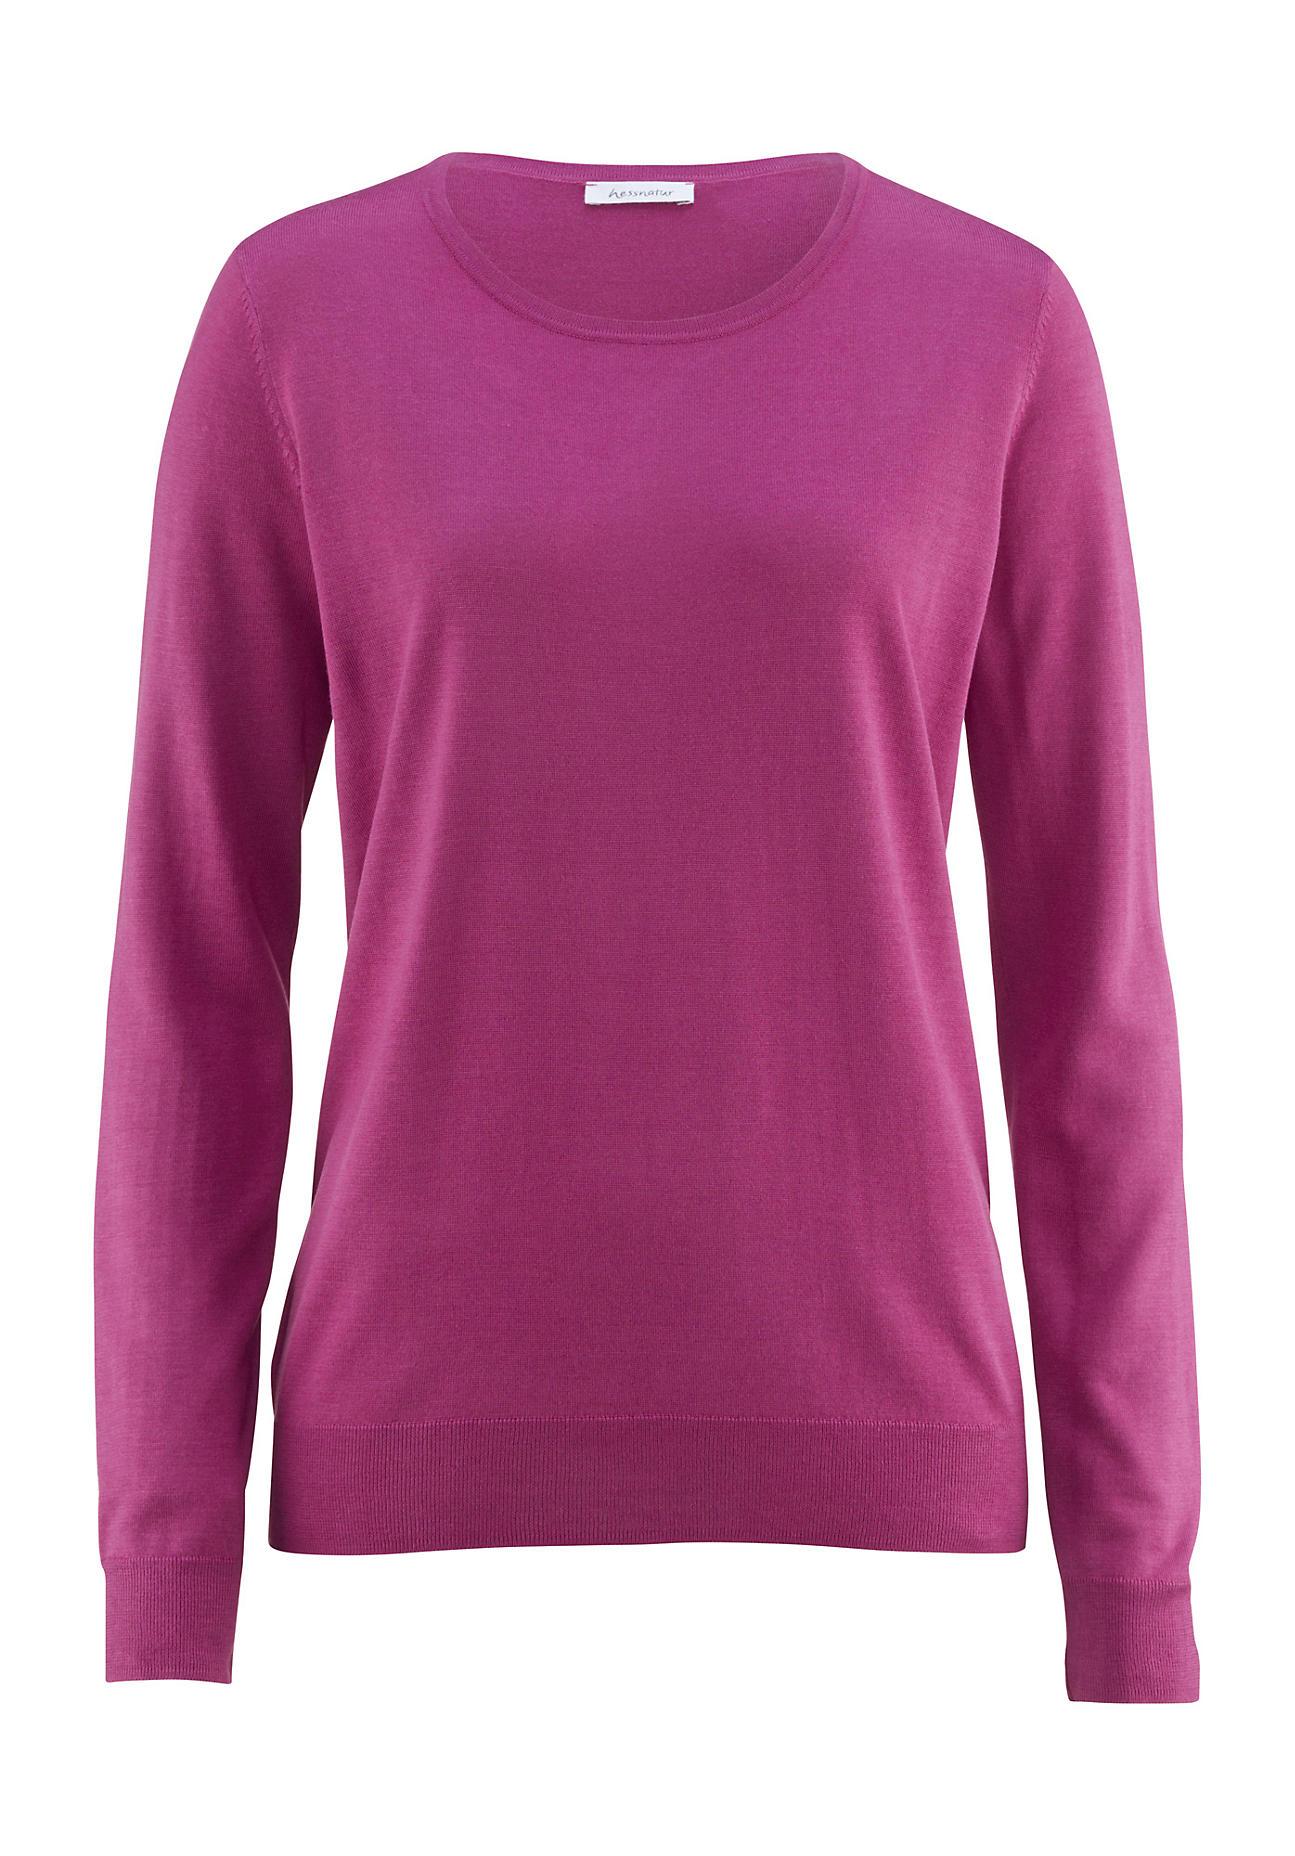 hessnatur Damen Pullover aus Bio Seide – lila – Größe 38